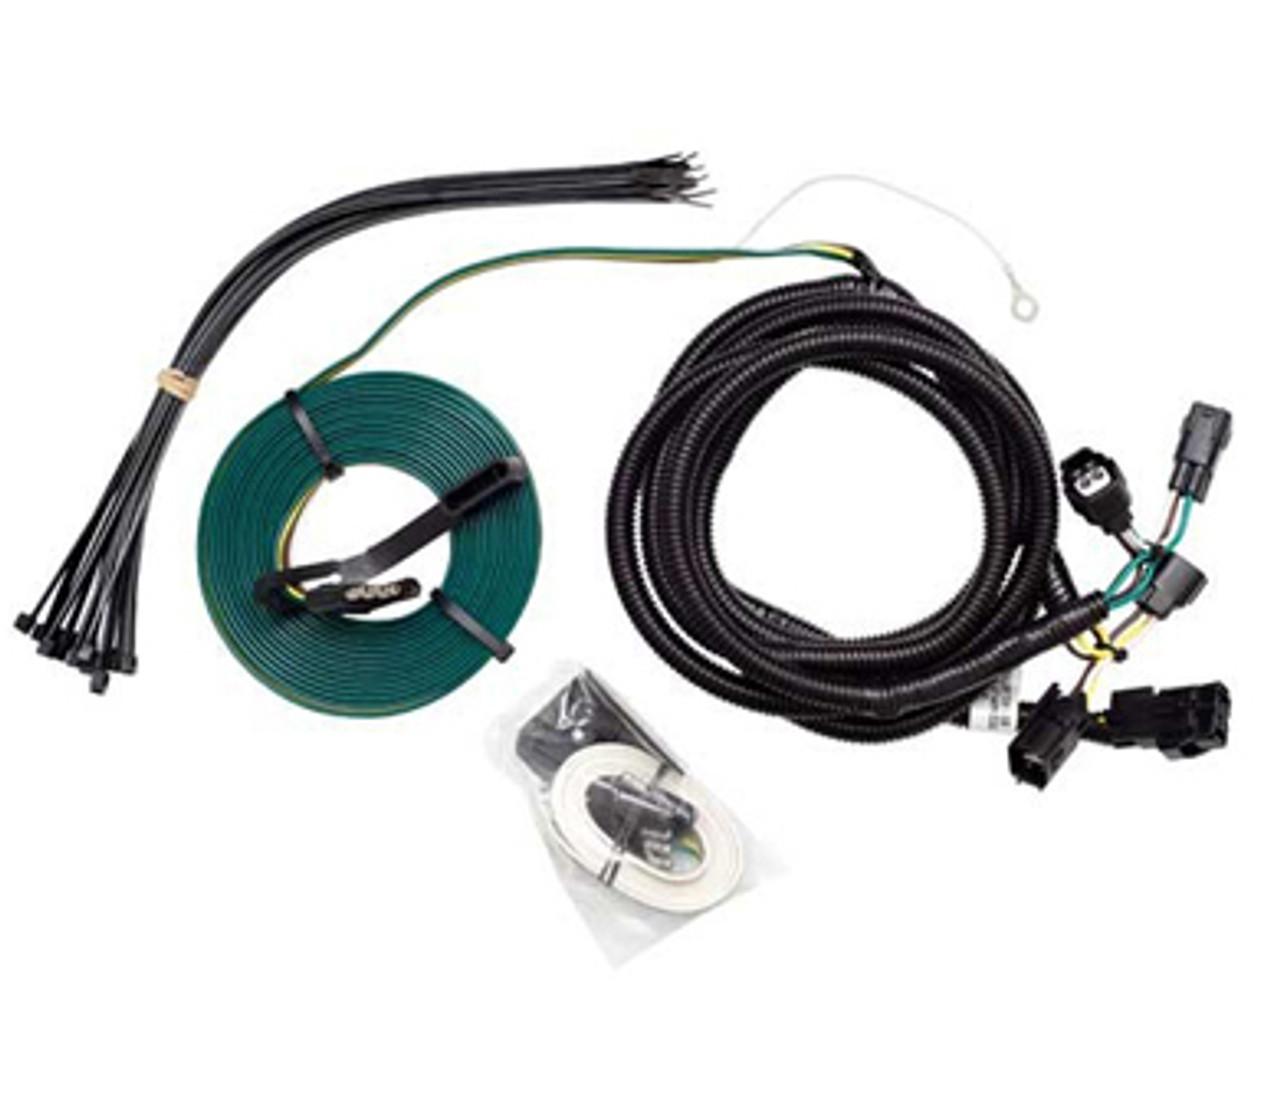 9523141 --- Demco Towed Connector - Buick Enclave, Chevrolet Malibu & Traverse